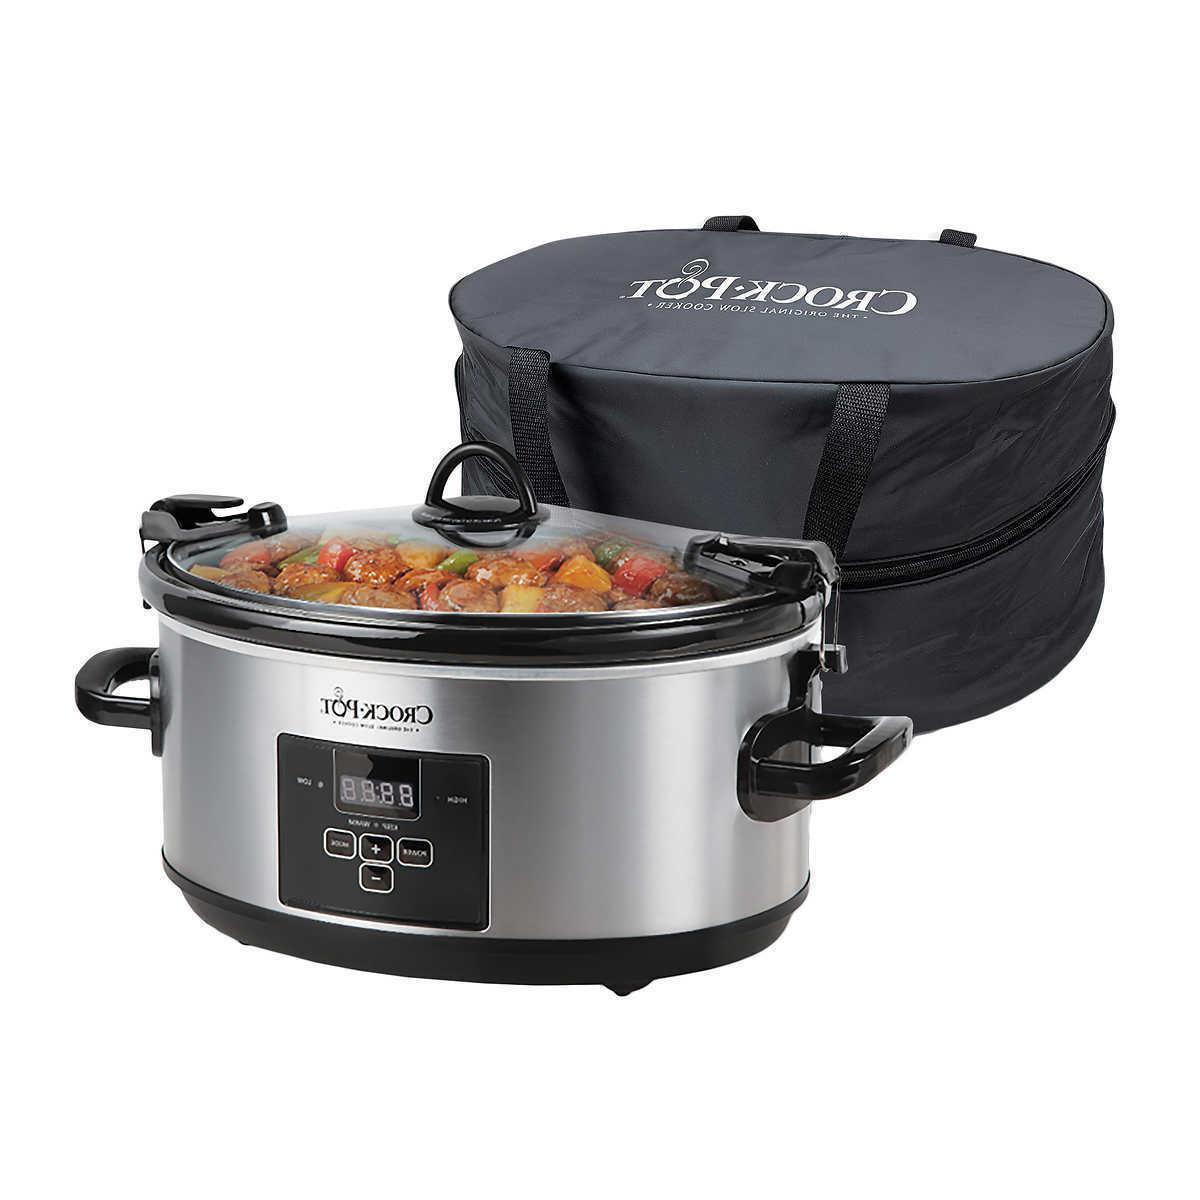 crock pot 7quart programmable cook and carry